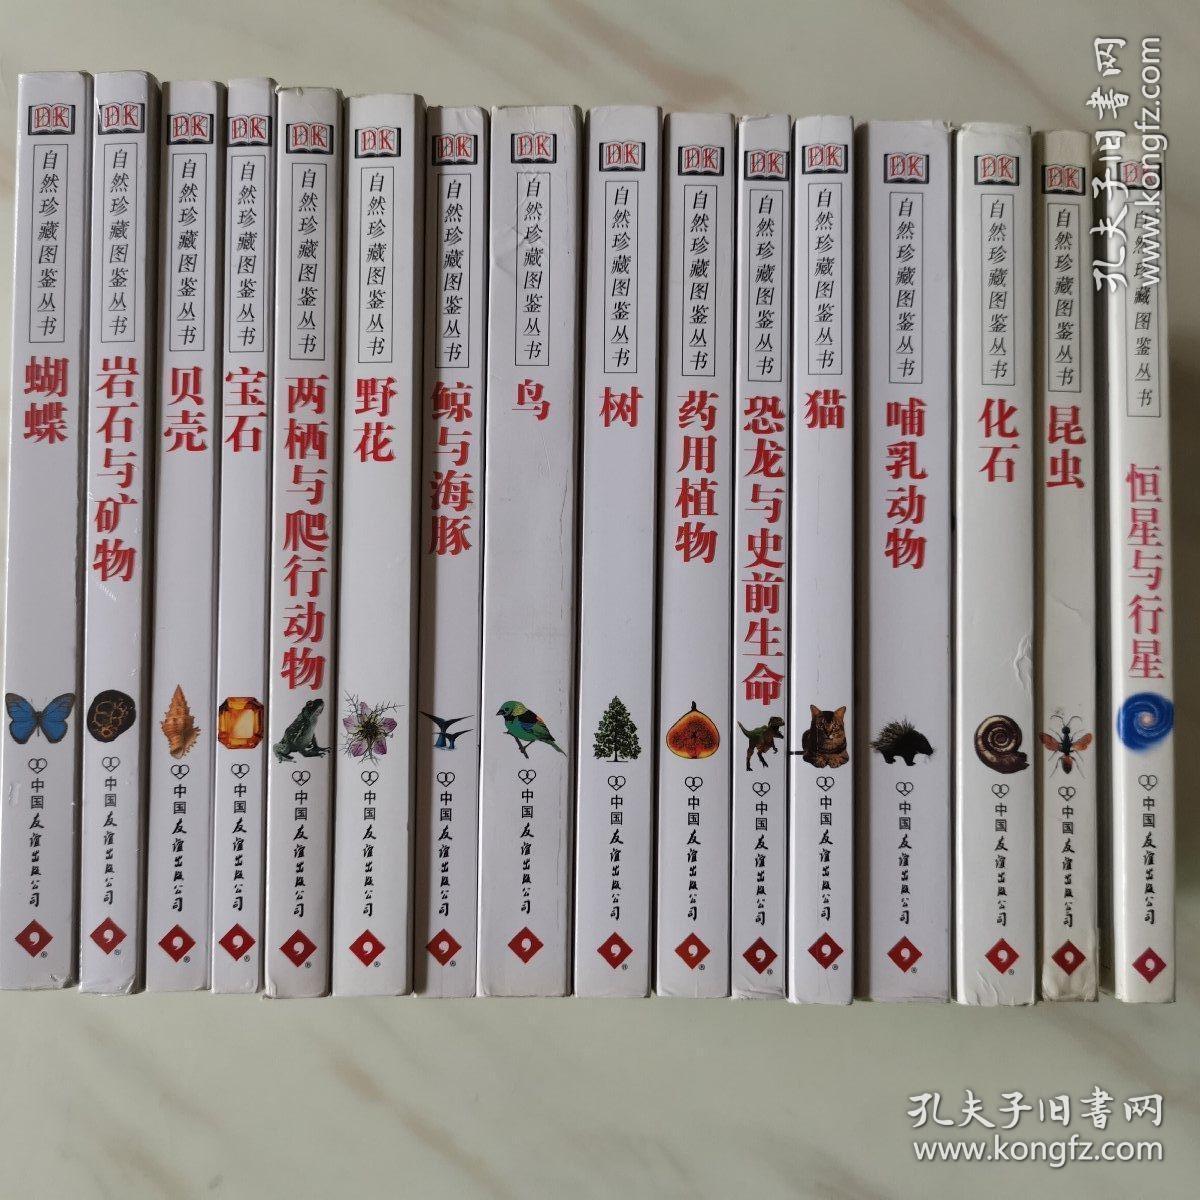 DK自然珍藏图鉴丛书, 全套16本,合售不单卖